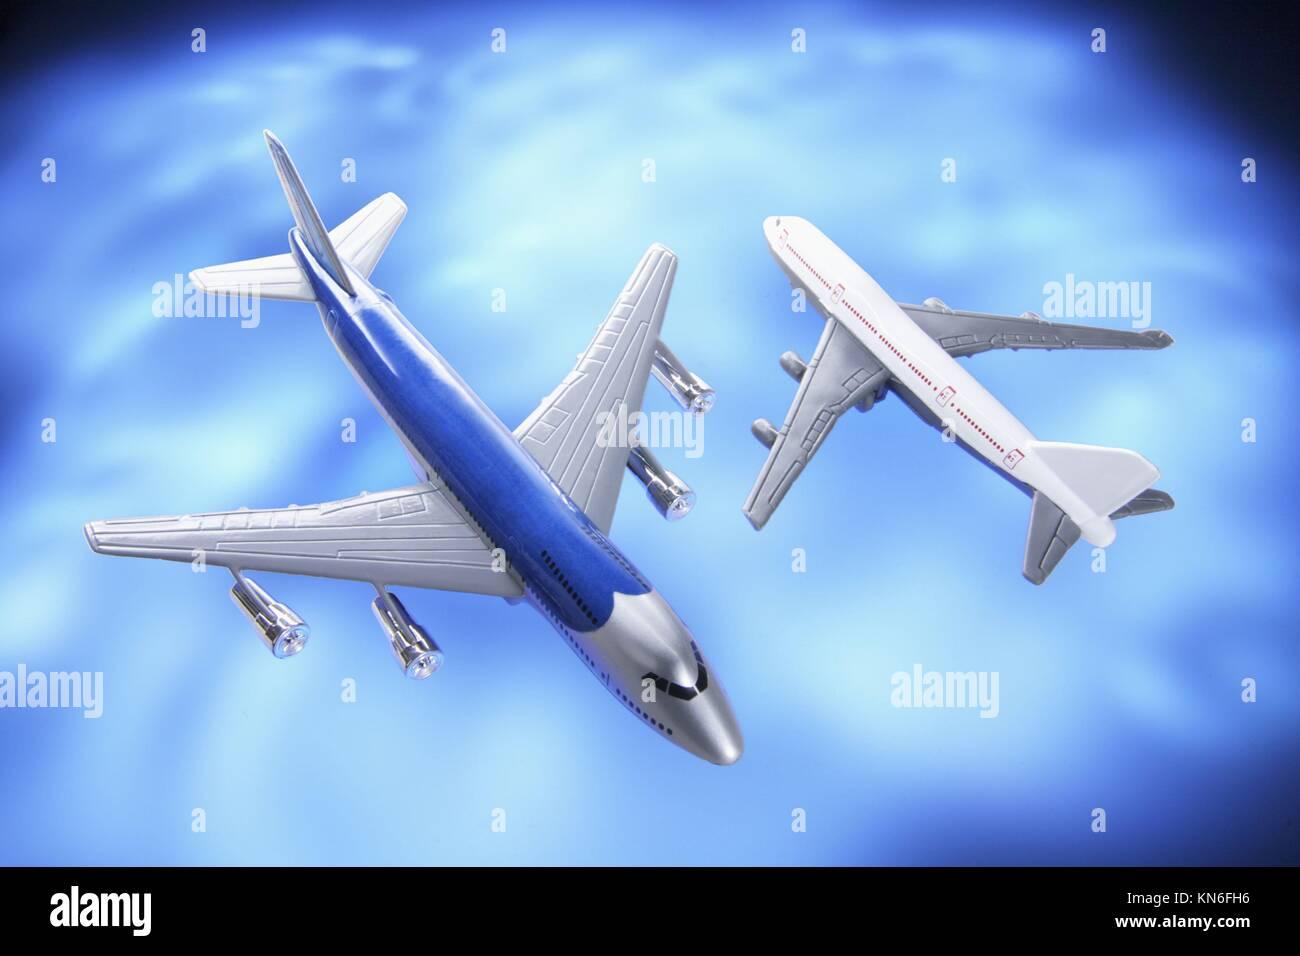 Model Planes. - Stock Image